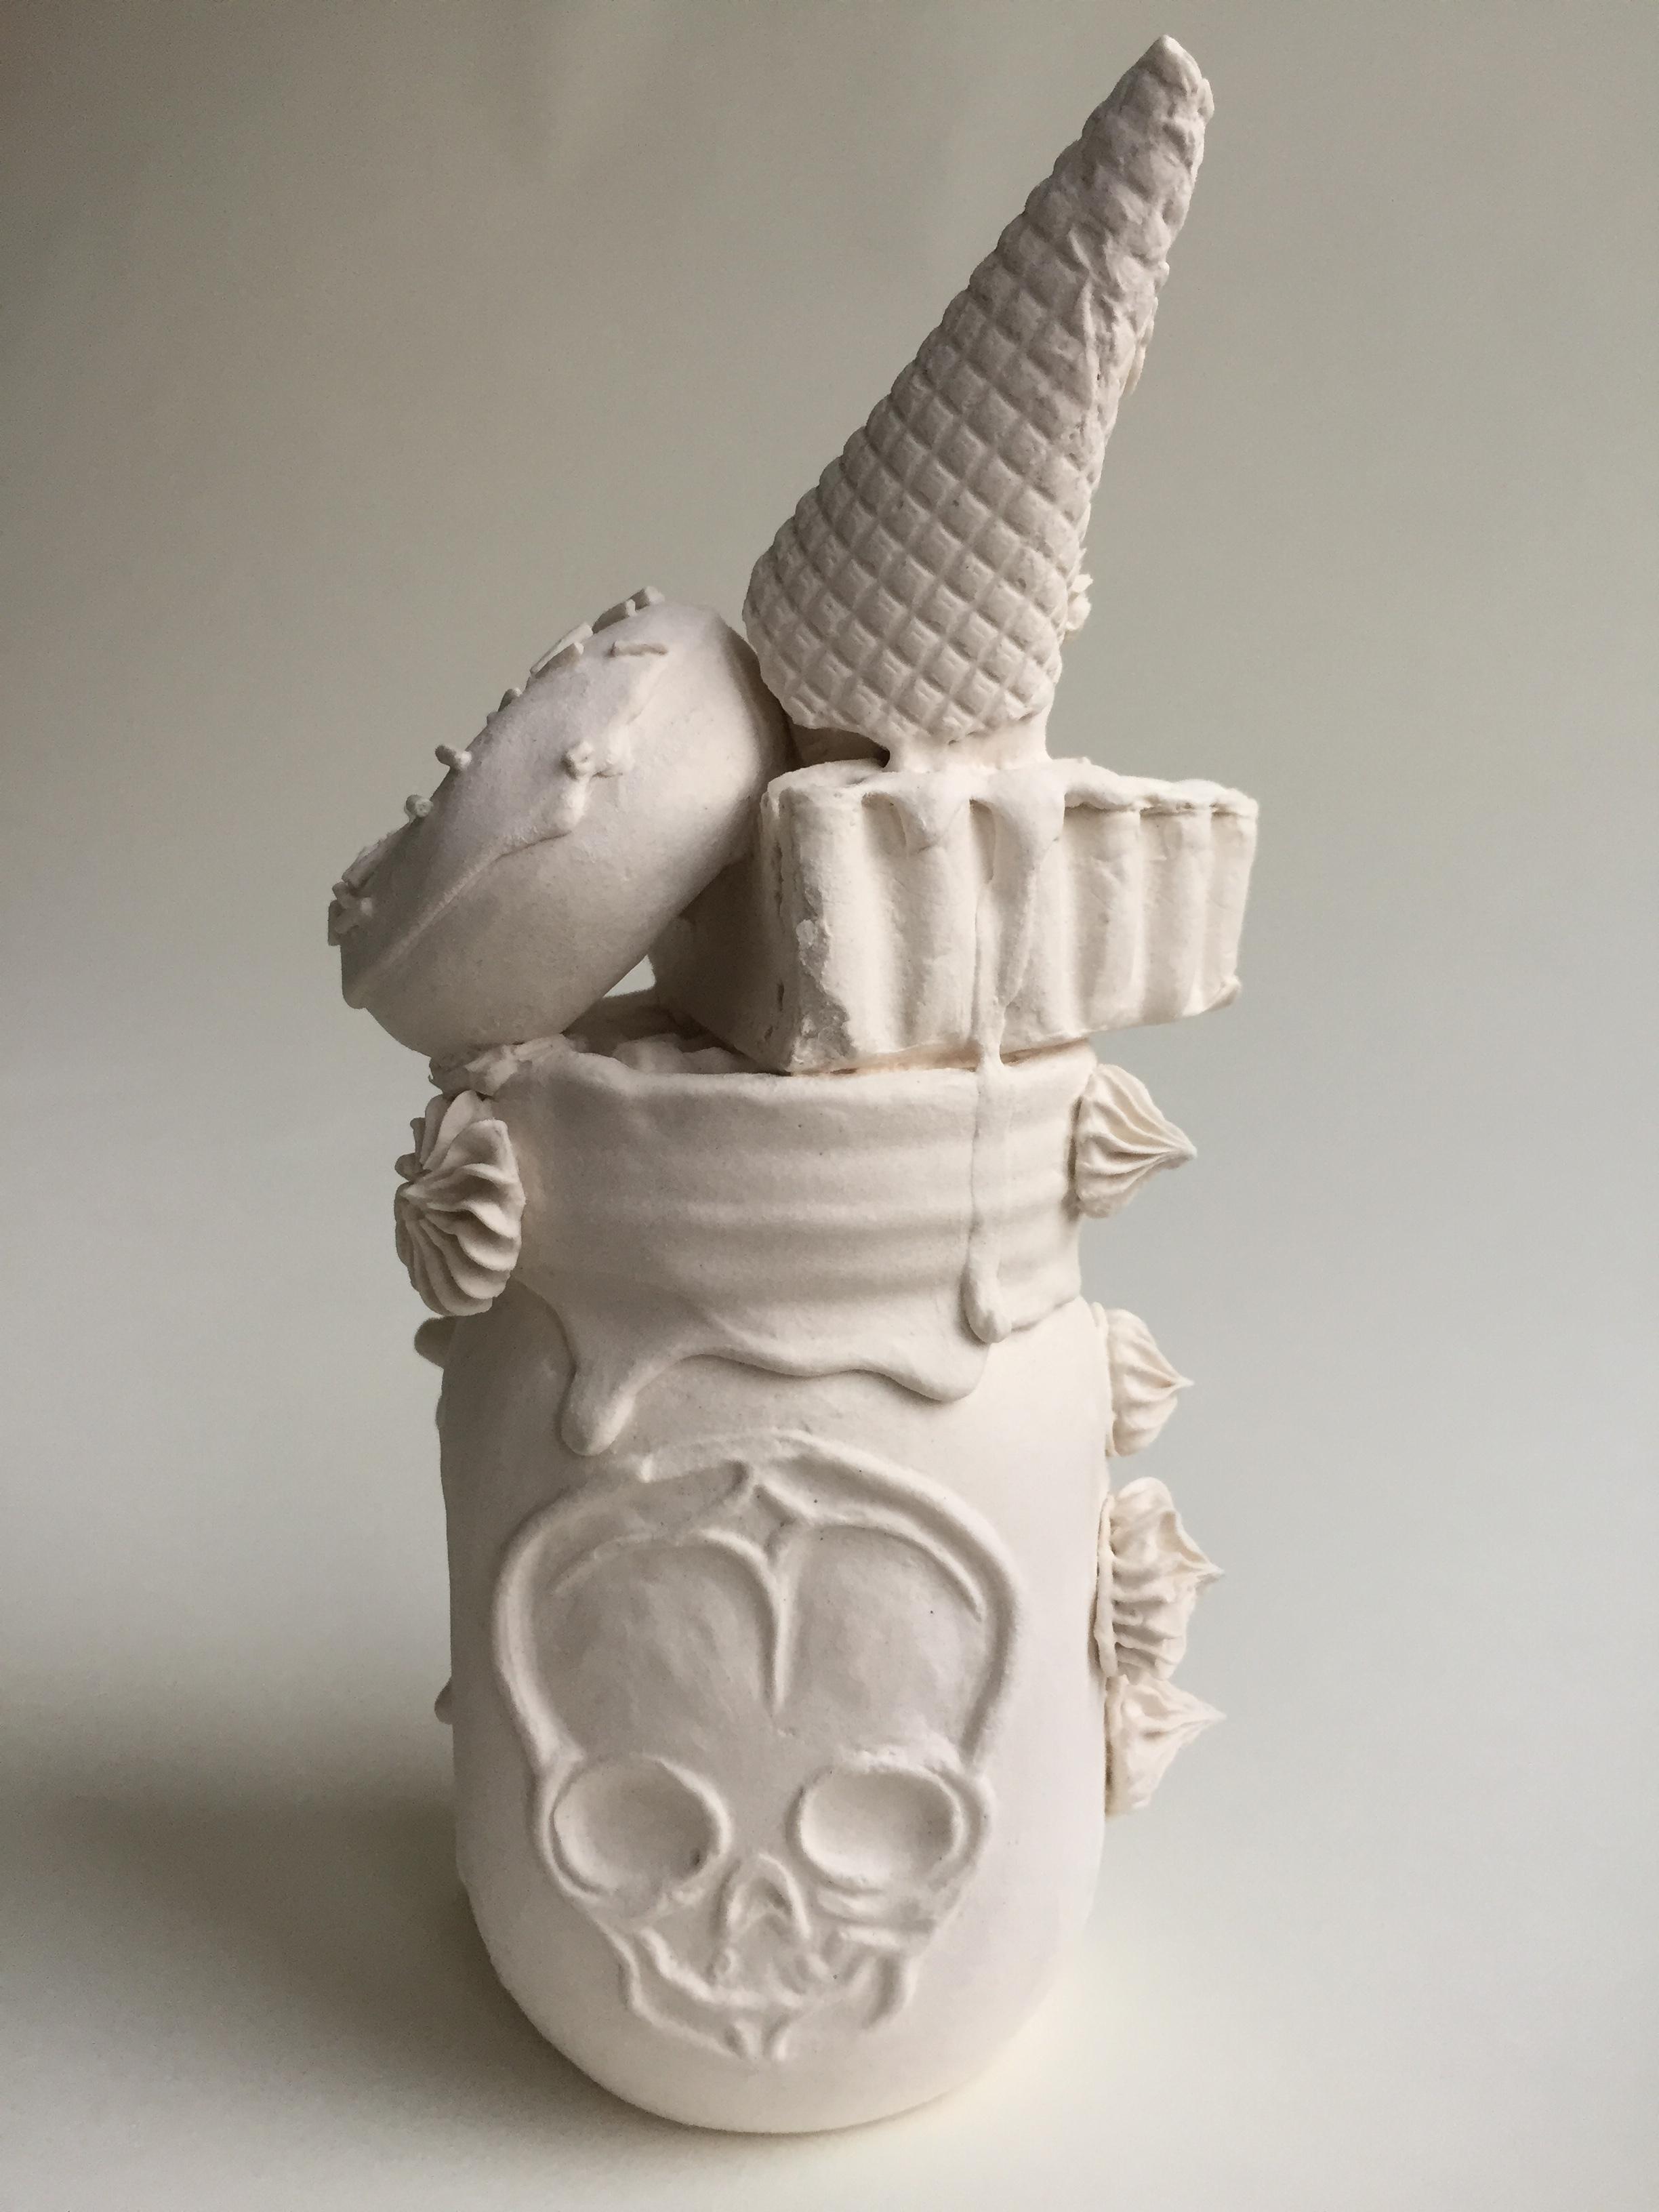 J_Tse_Ice Cream Float Jar V_Side5.jpg